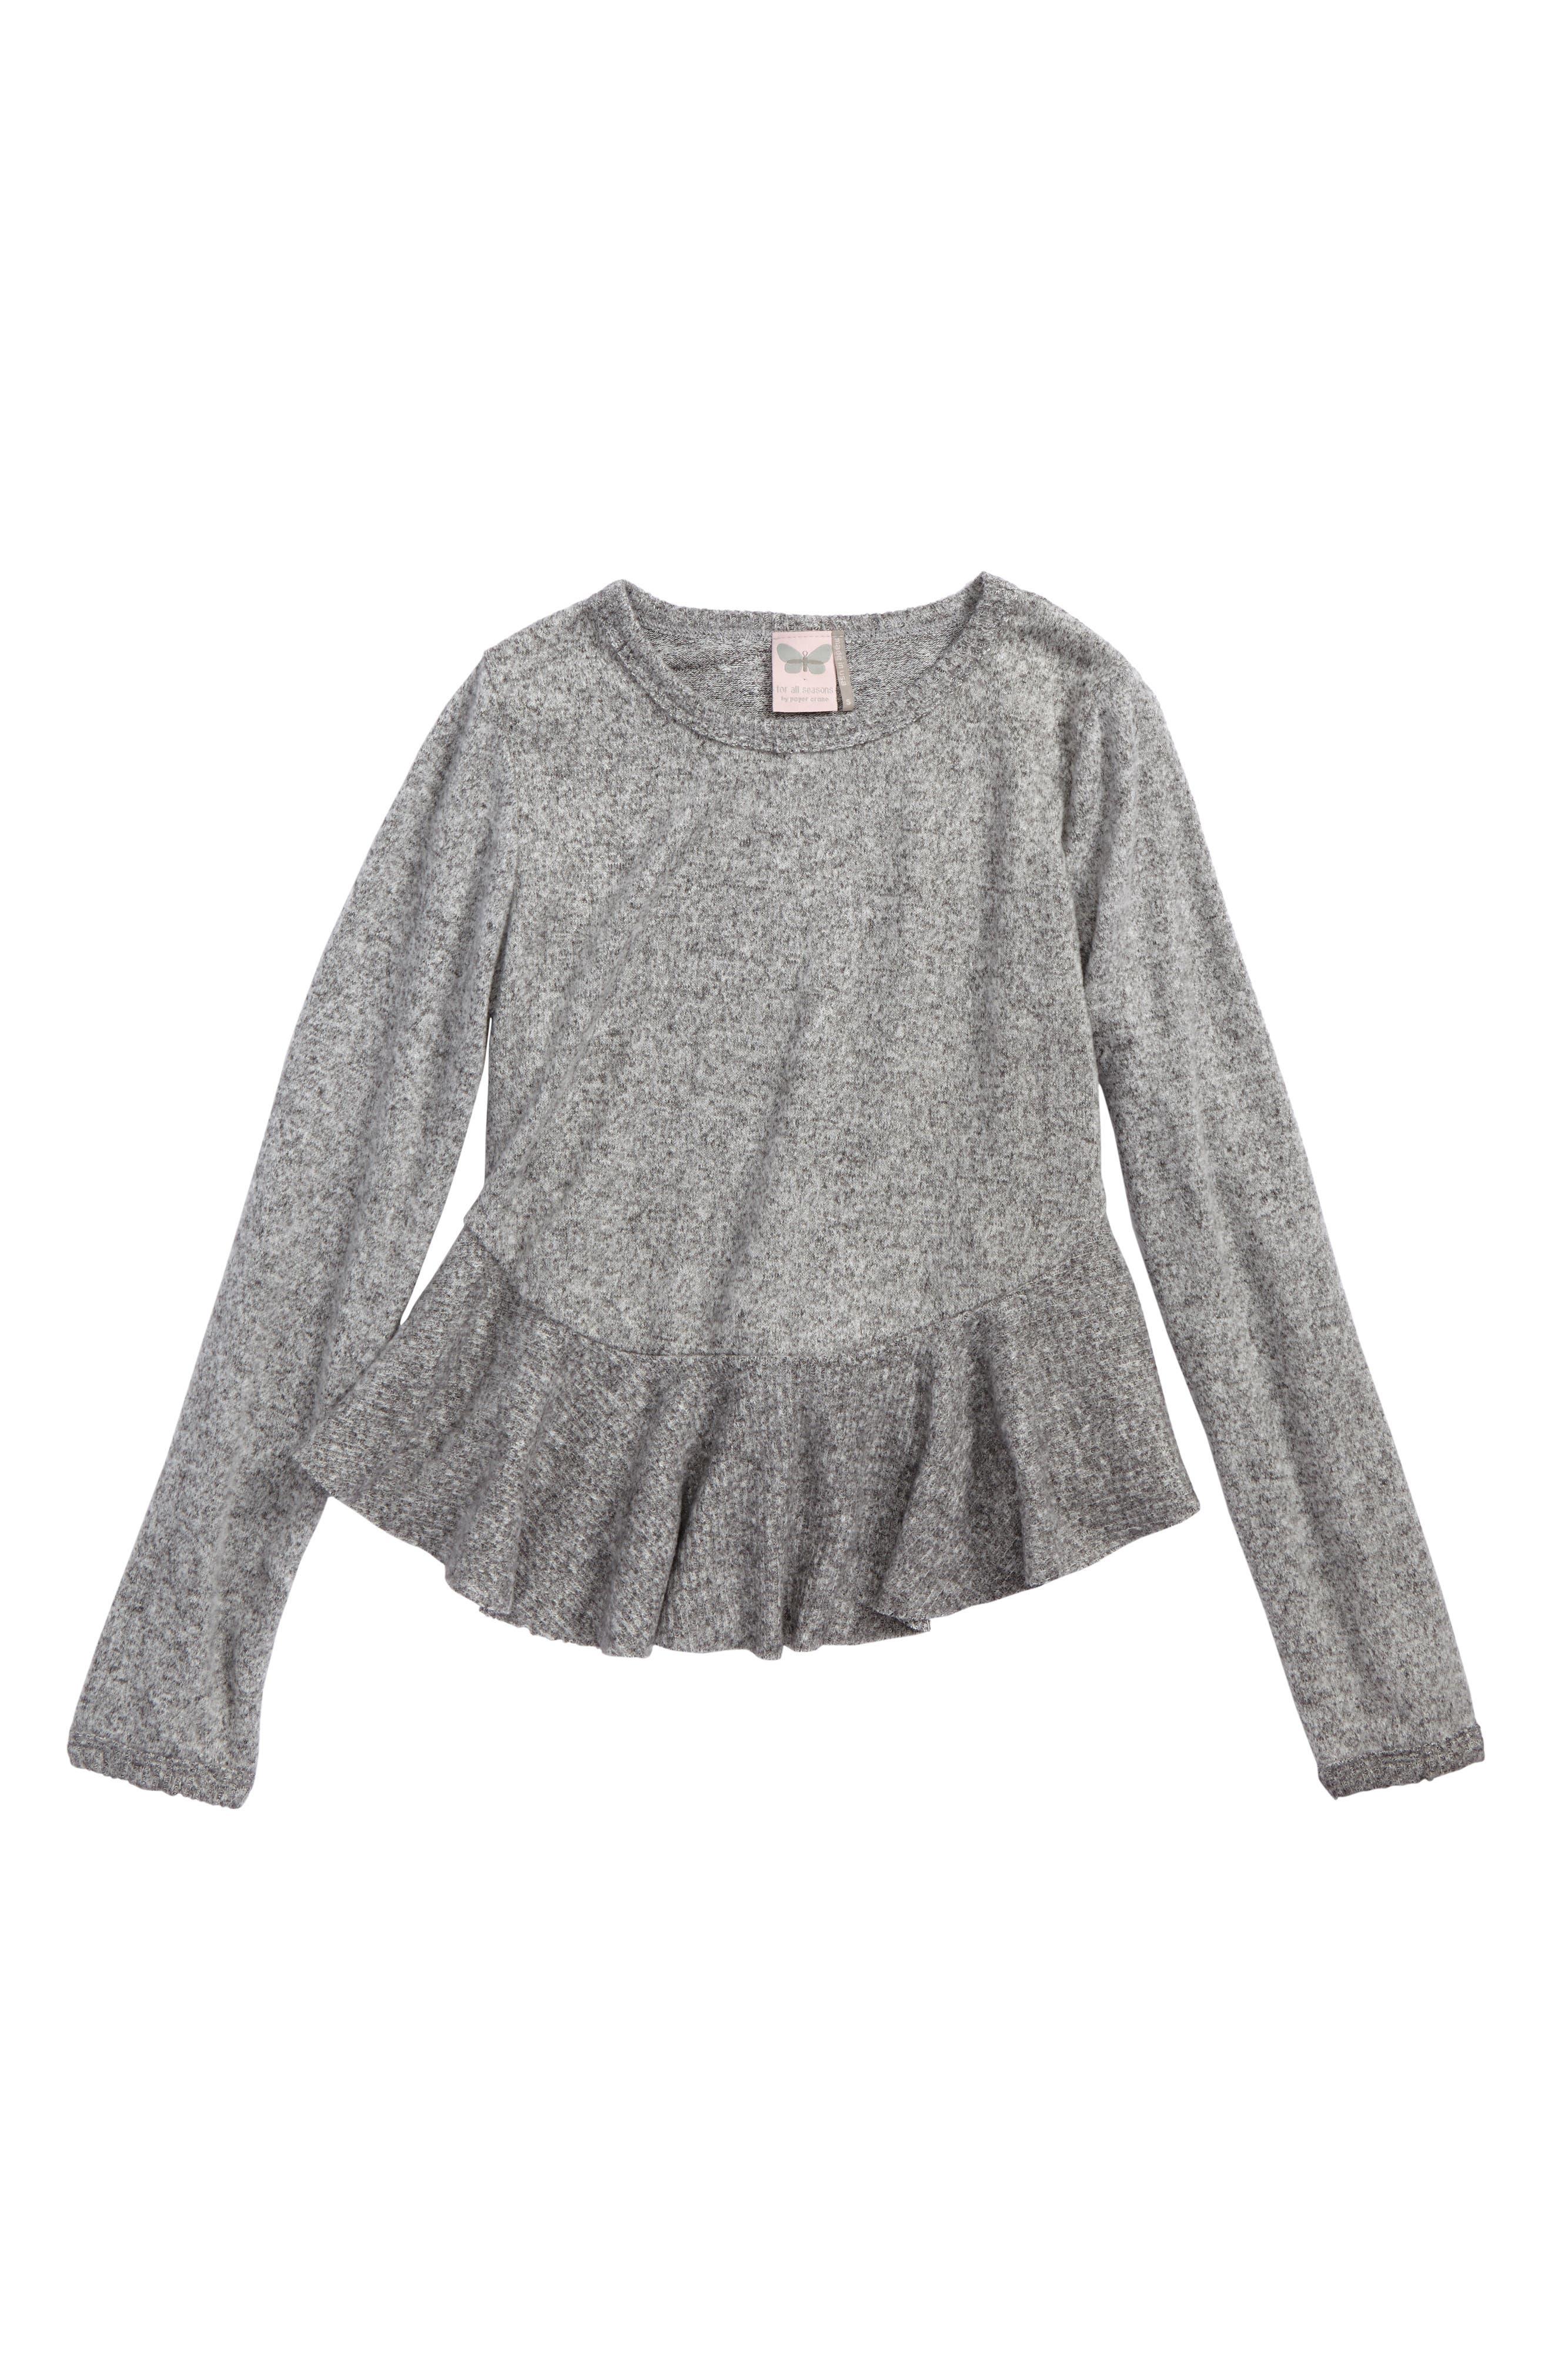 Fleece Peplum Top,                         Main,                         color, 021